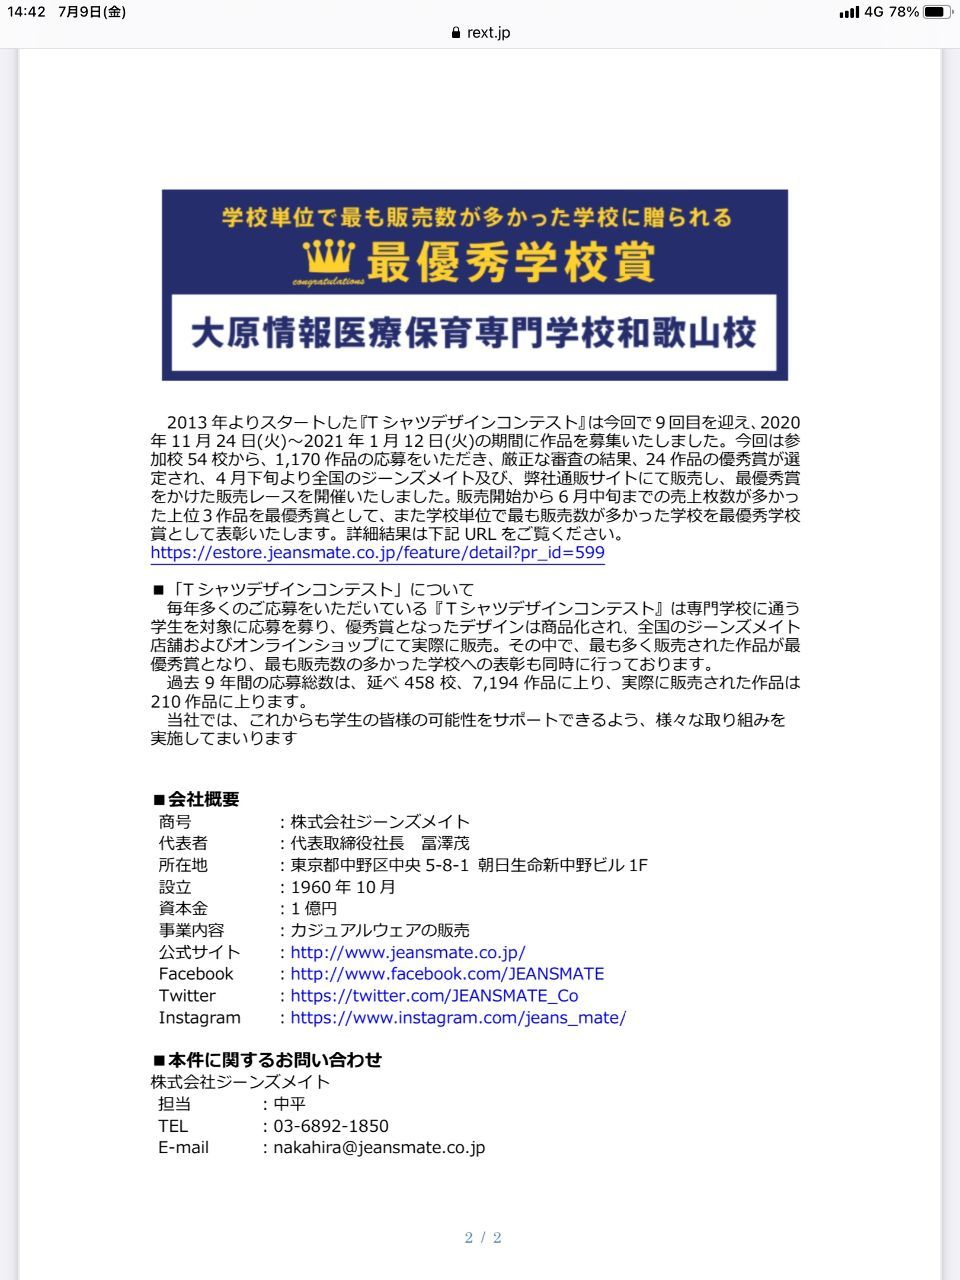 7697 - REXT(株) > 『鬼滅テレビ 新情報発表スペシャル』ABEMAで 7月13日に配信決定 竈門炭治郎役・花江